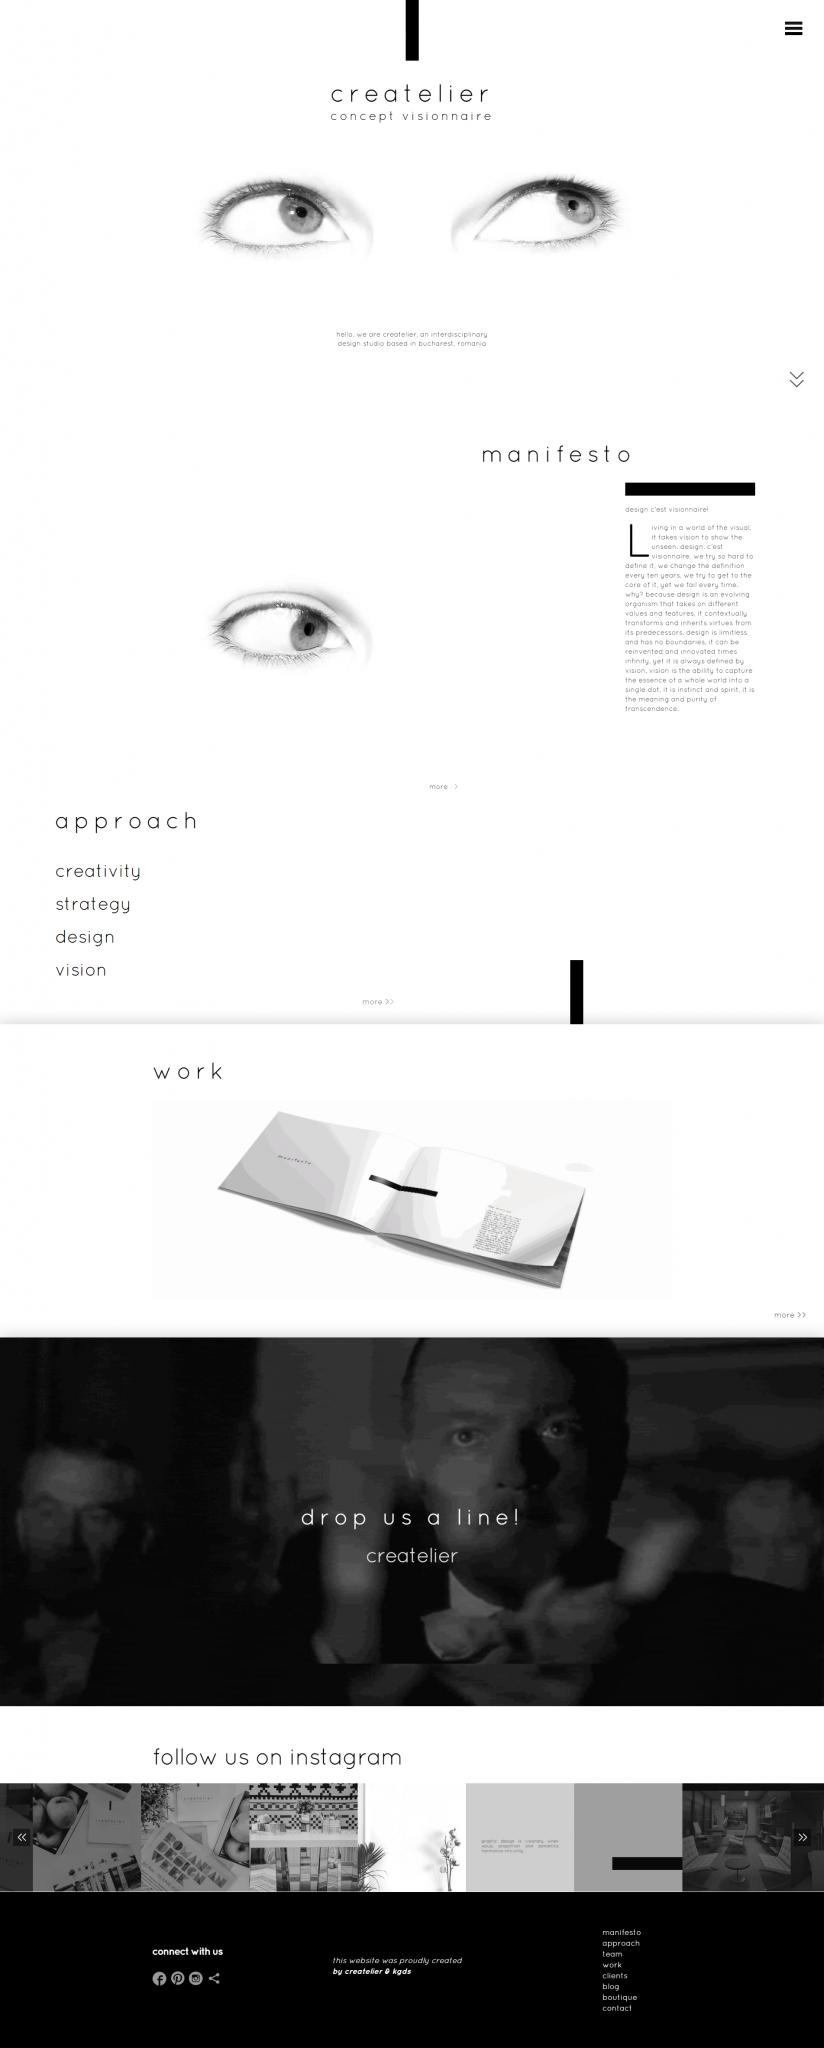 createlier-concept-visionnairepag